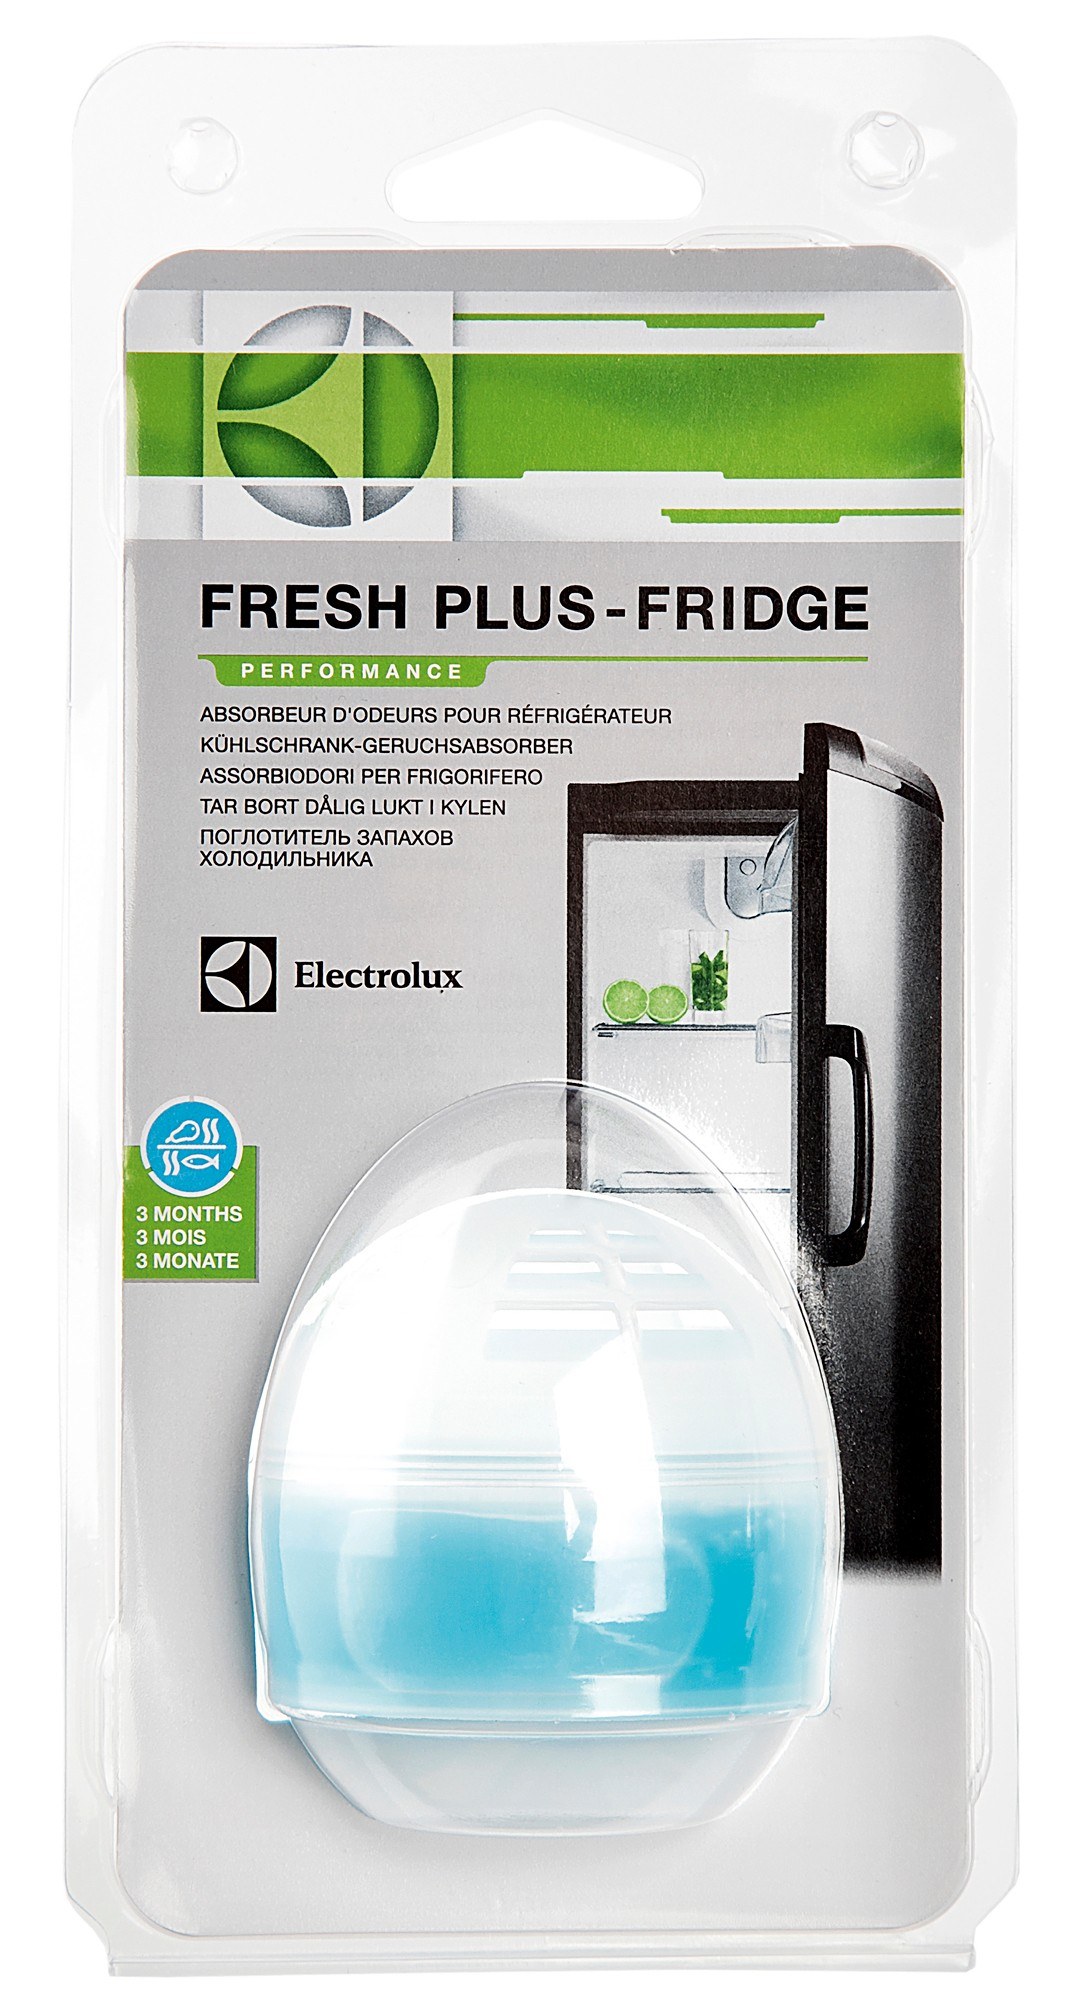 206321 : Electrolux Igloo Fresh